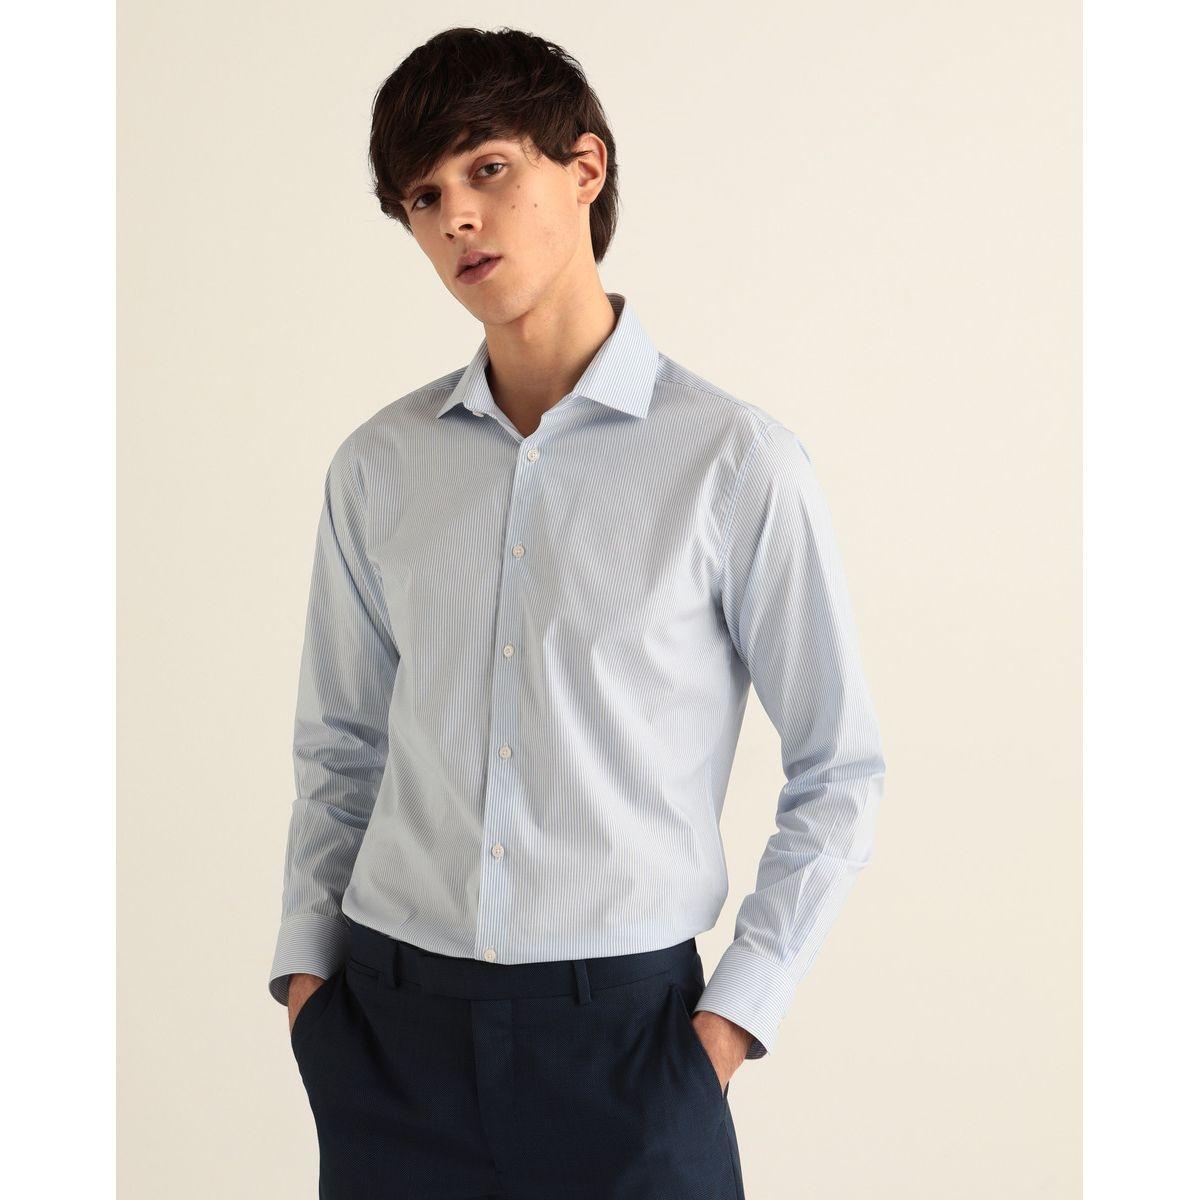 Chemise slim habillée  repassage facile  rayée bleu